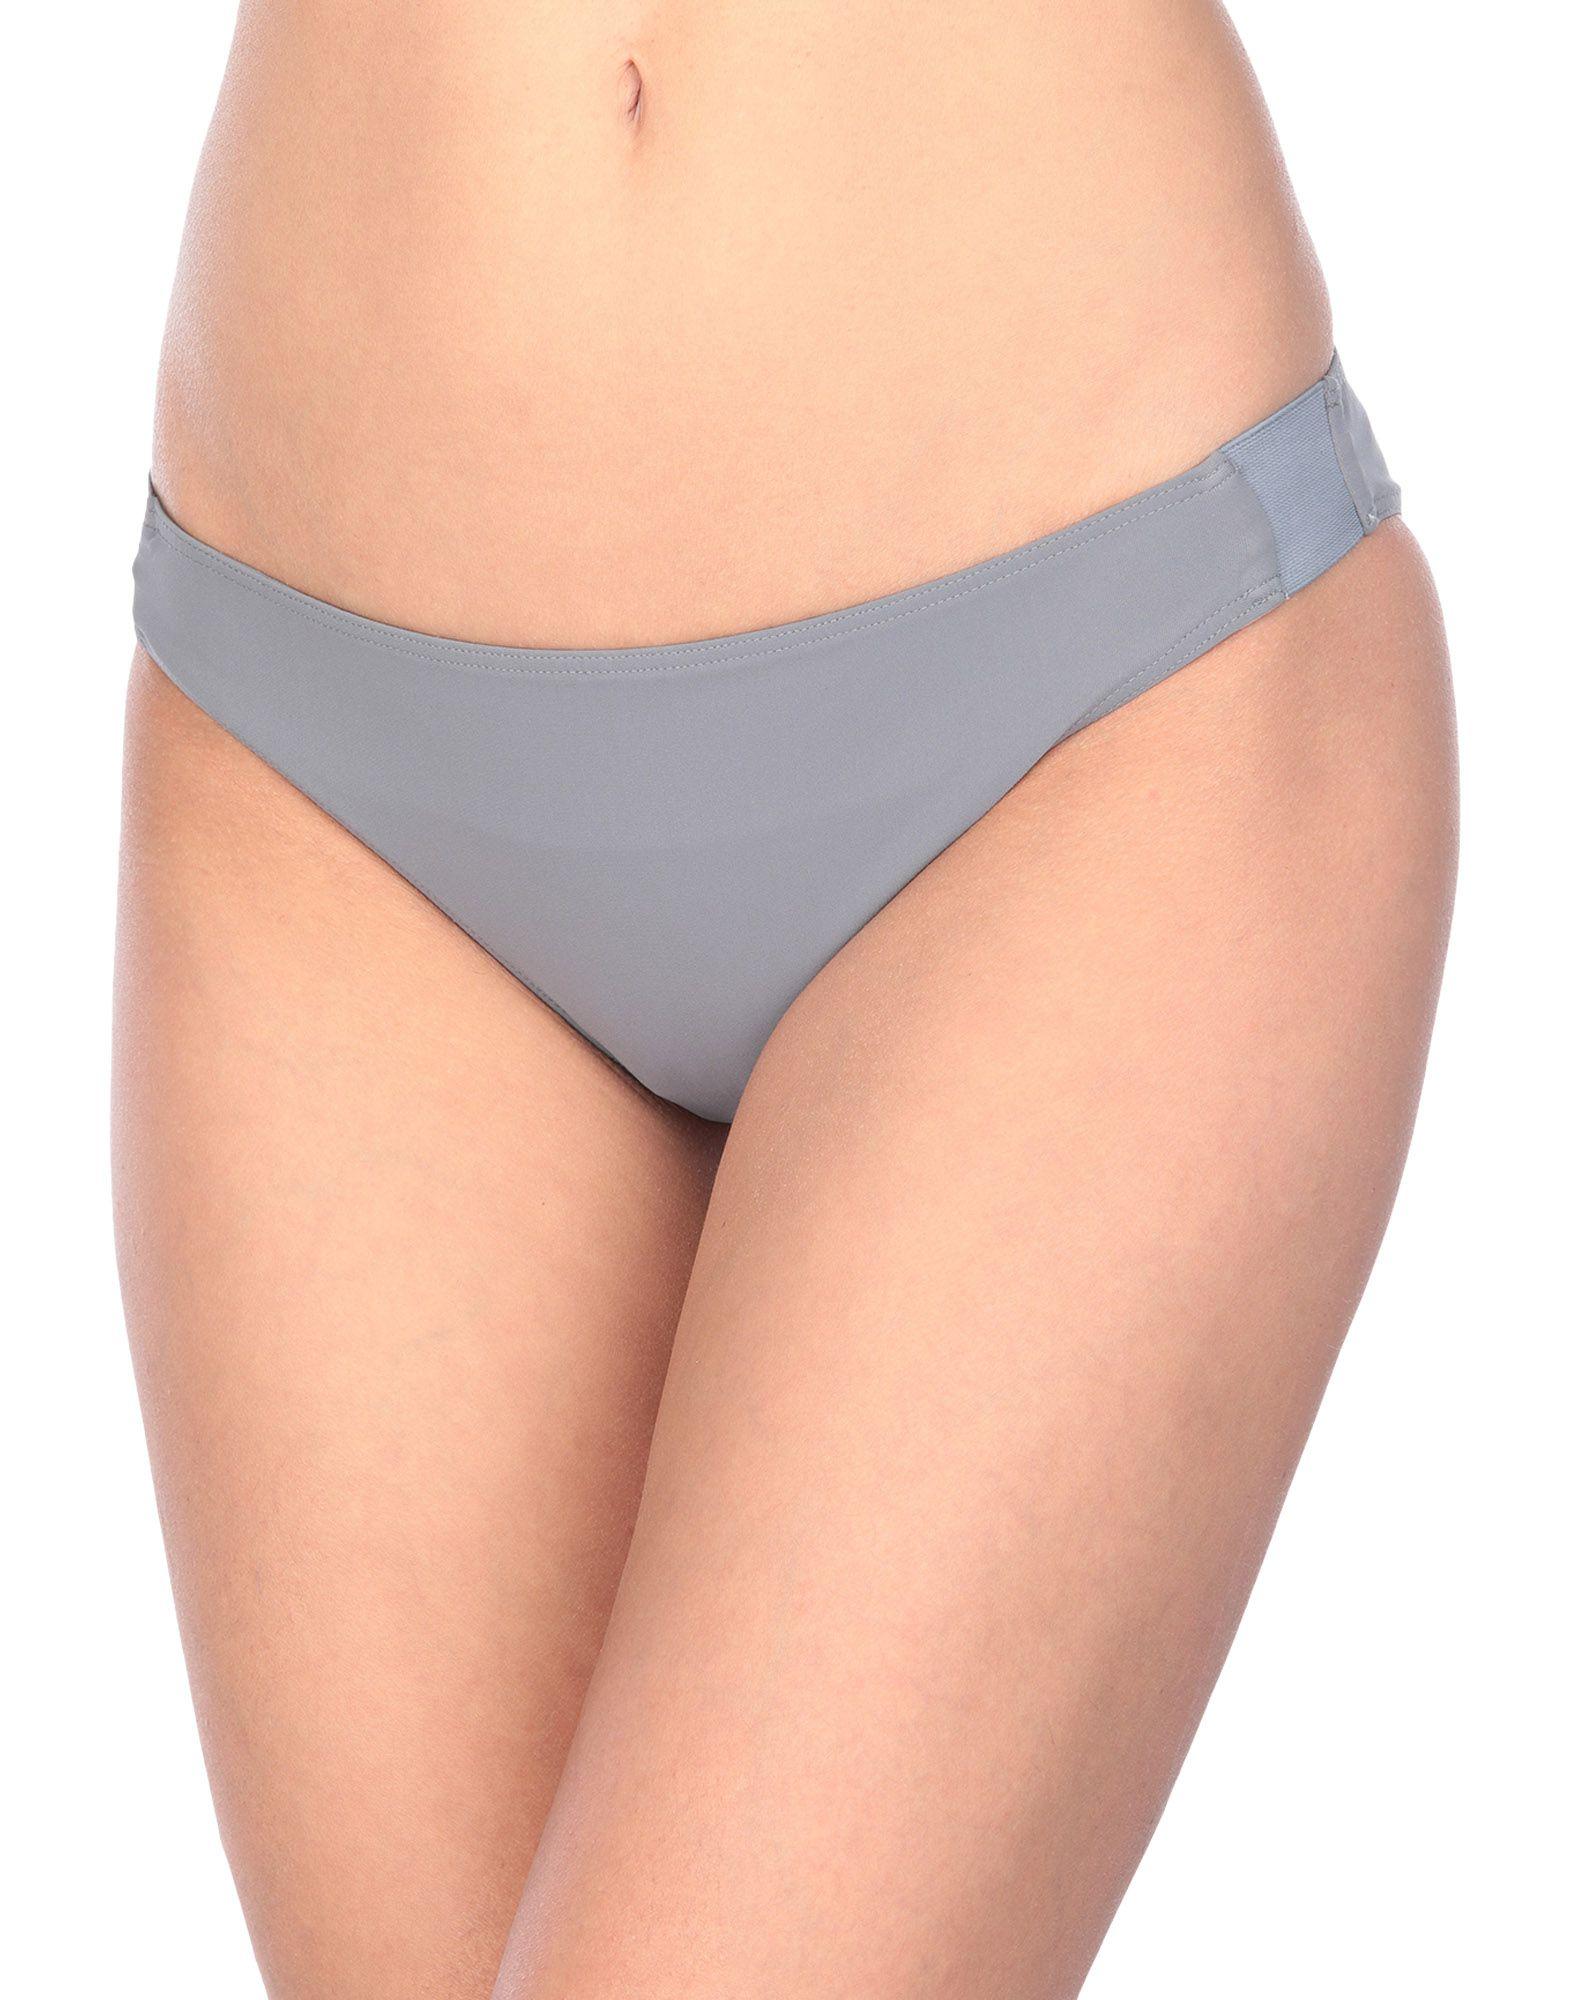 RICK OWENS Swim briefs. synthetic jersey, no appliqués, basic solid color, elasticized waist, stretch. 68% Polyamide, 32% Elastane